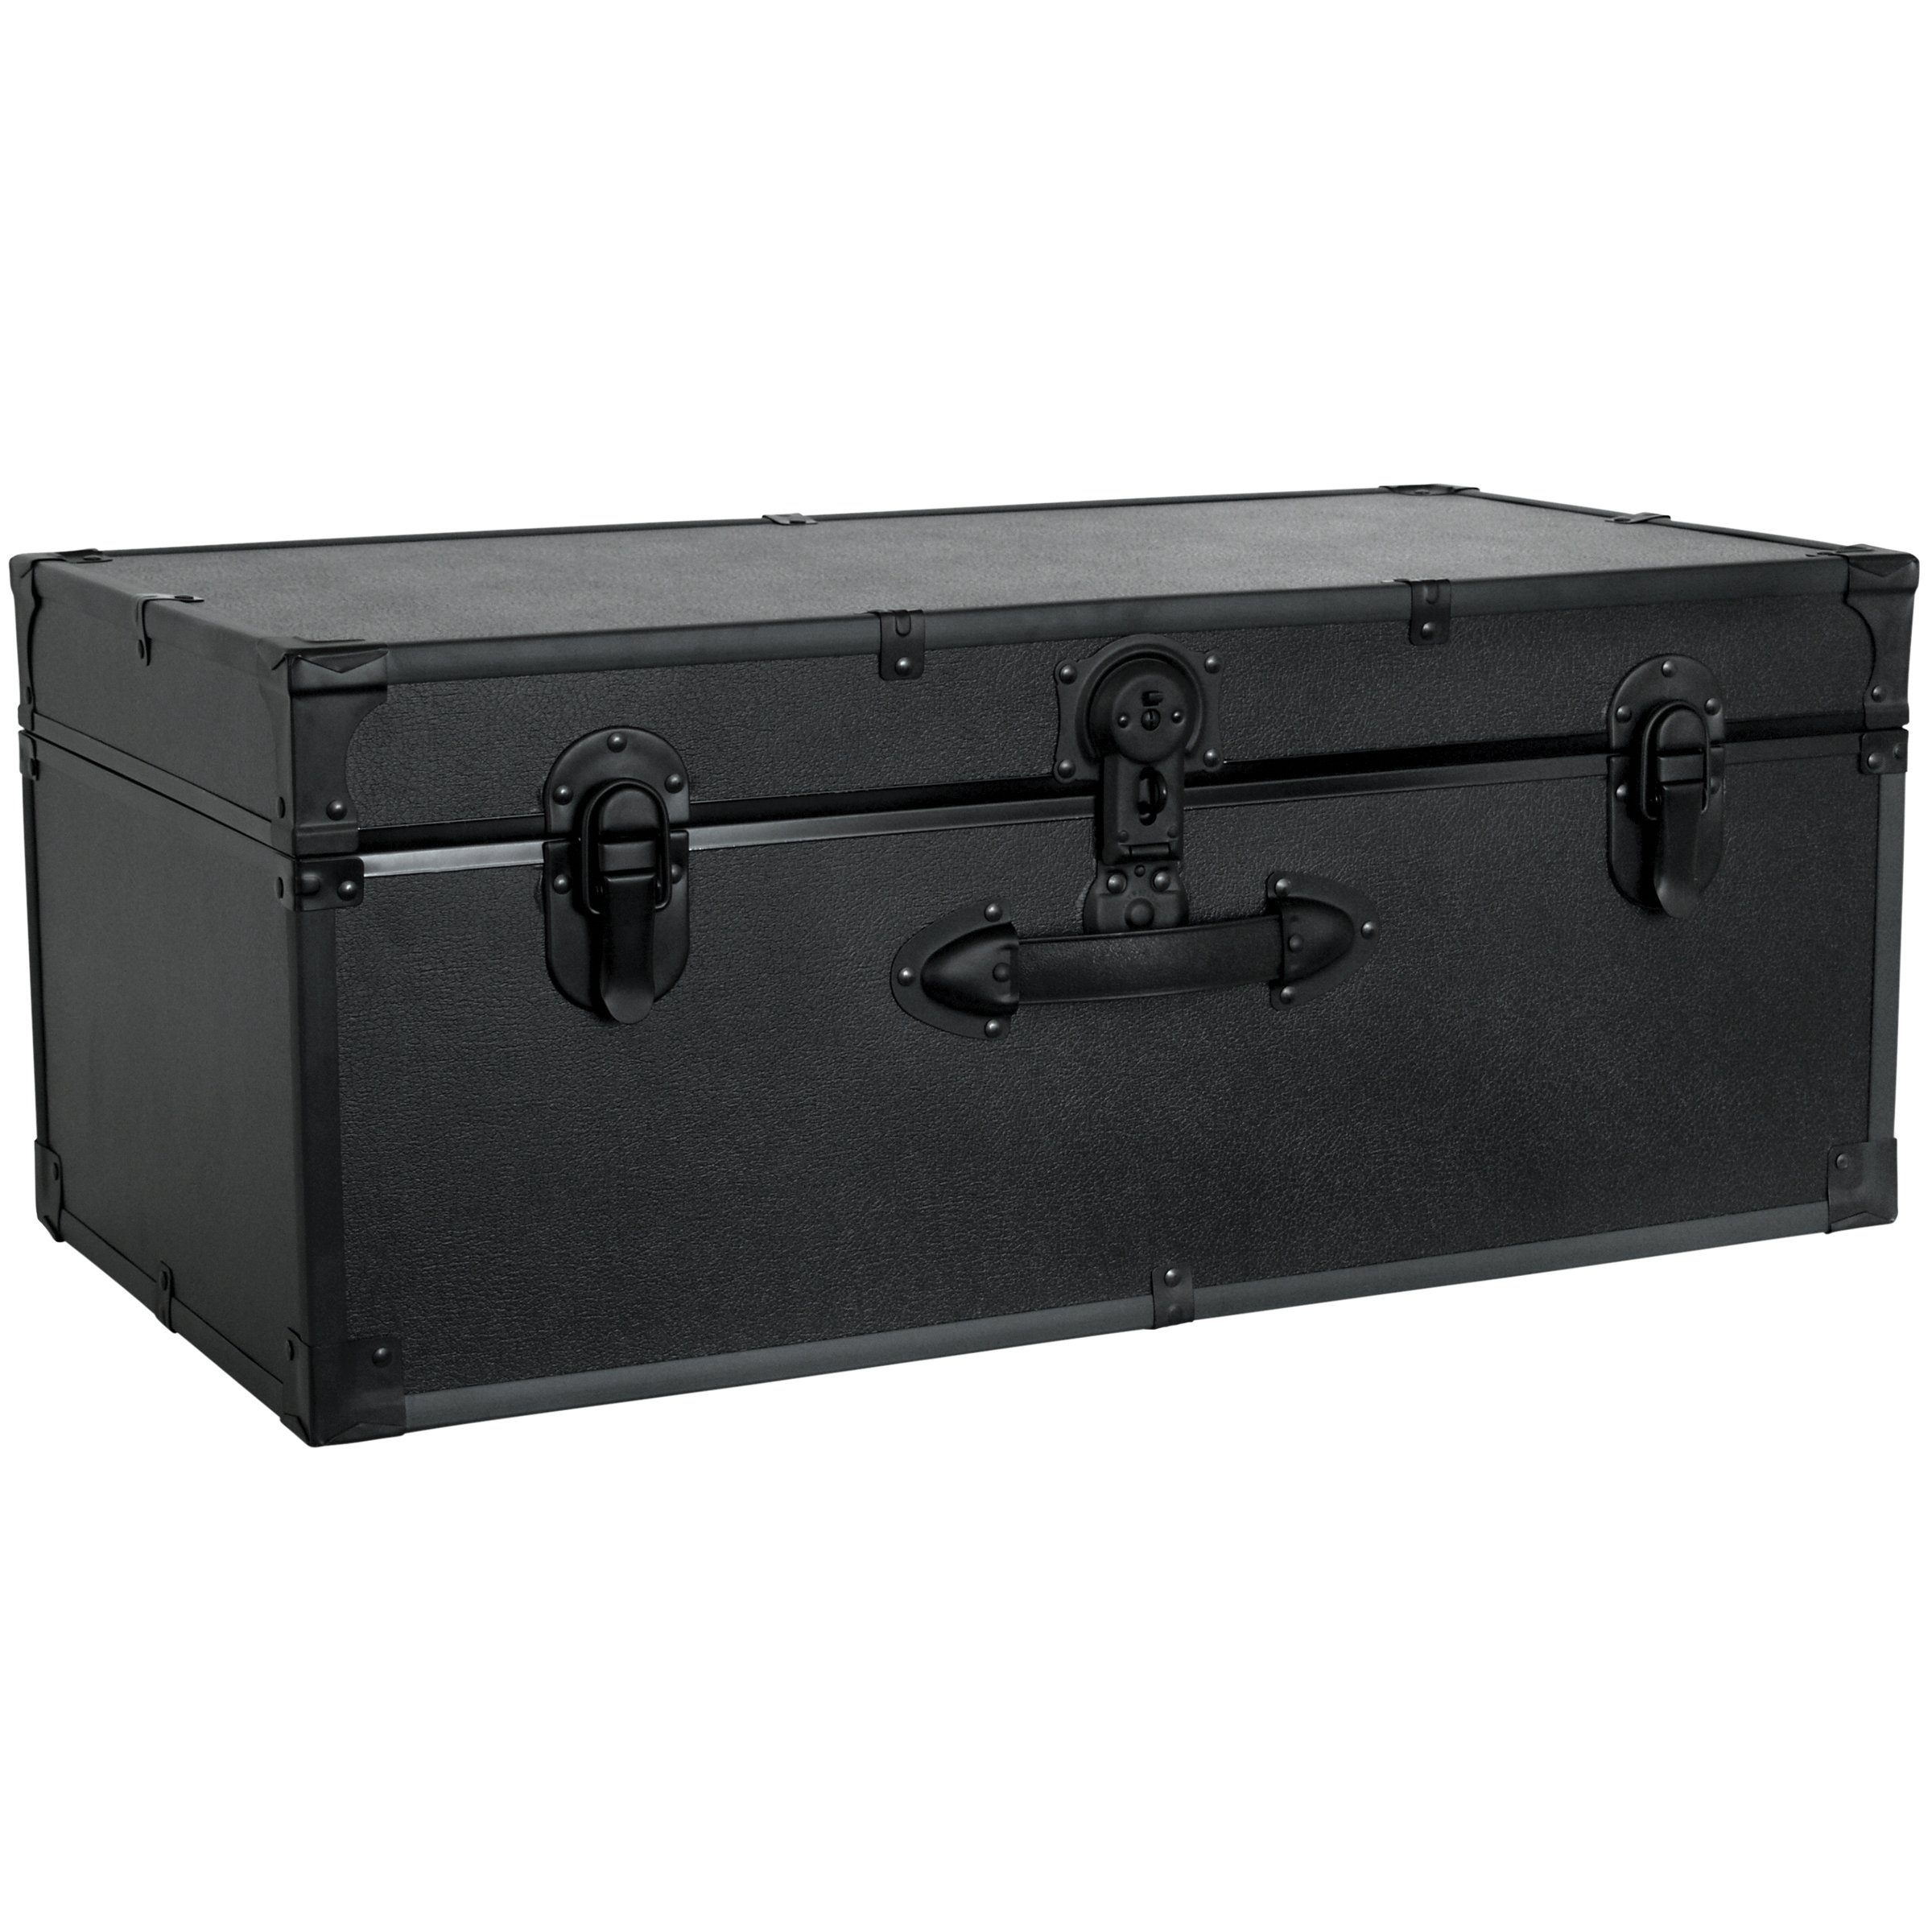 Seward Trunk Barracks Footlocker Trunk, Black, 30-inch (SWD5115-10)